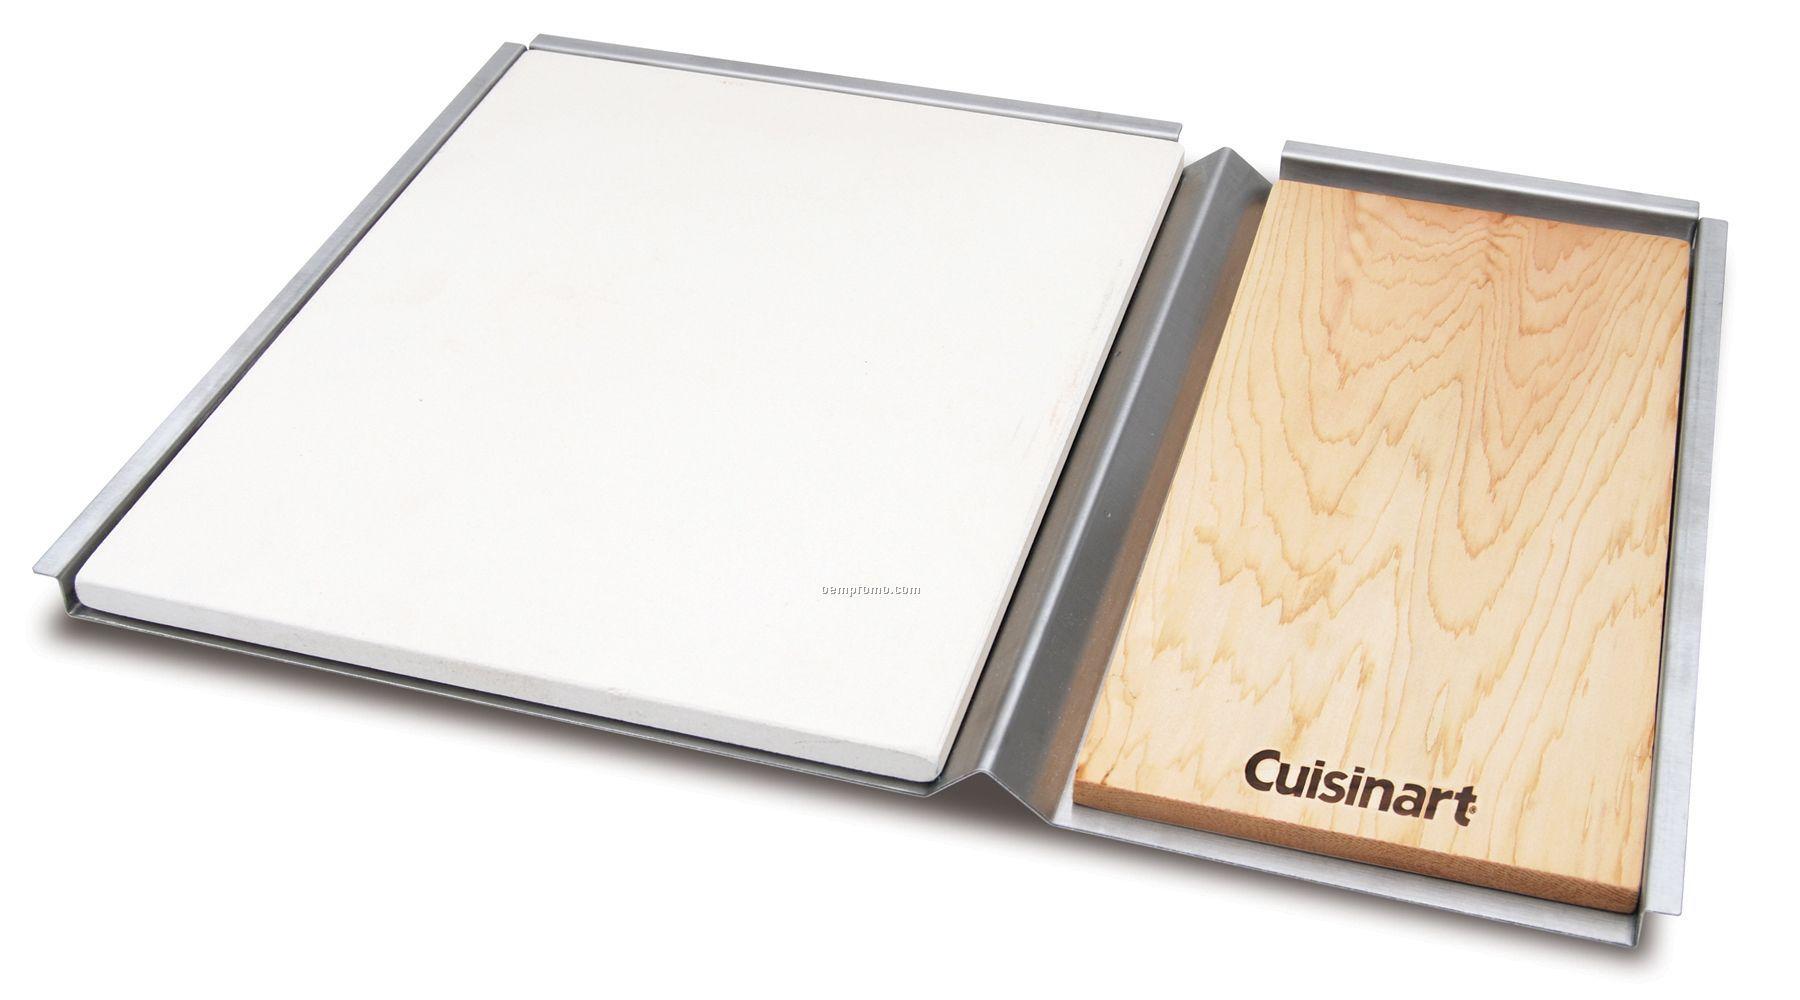 Cuisinart Omni Panel Versatile Grilling Surface